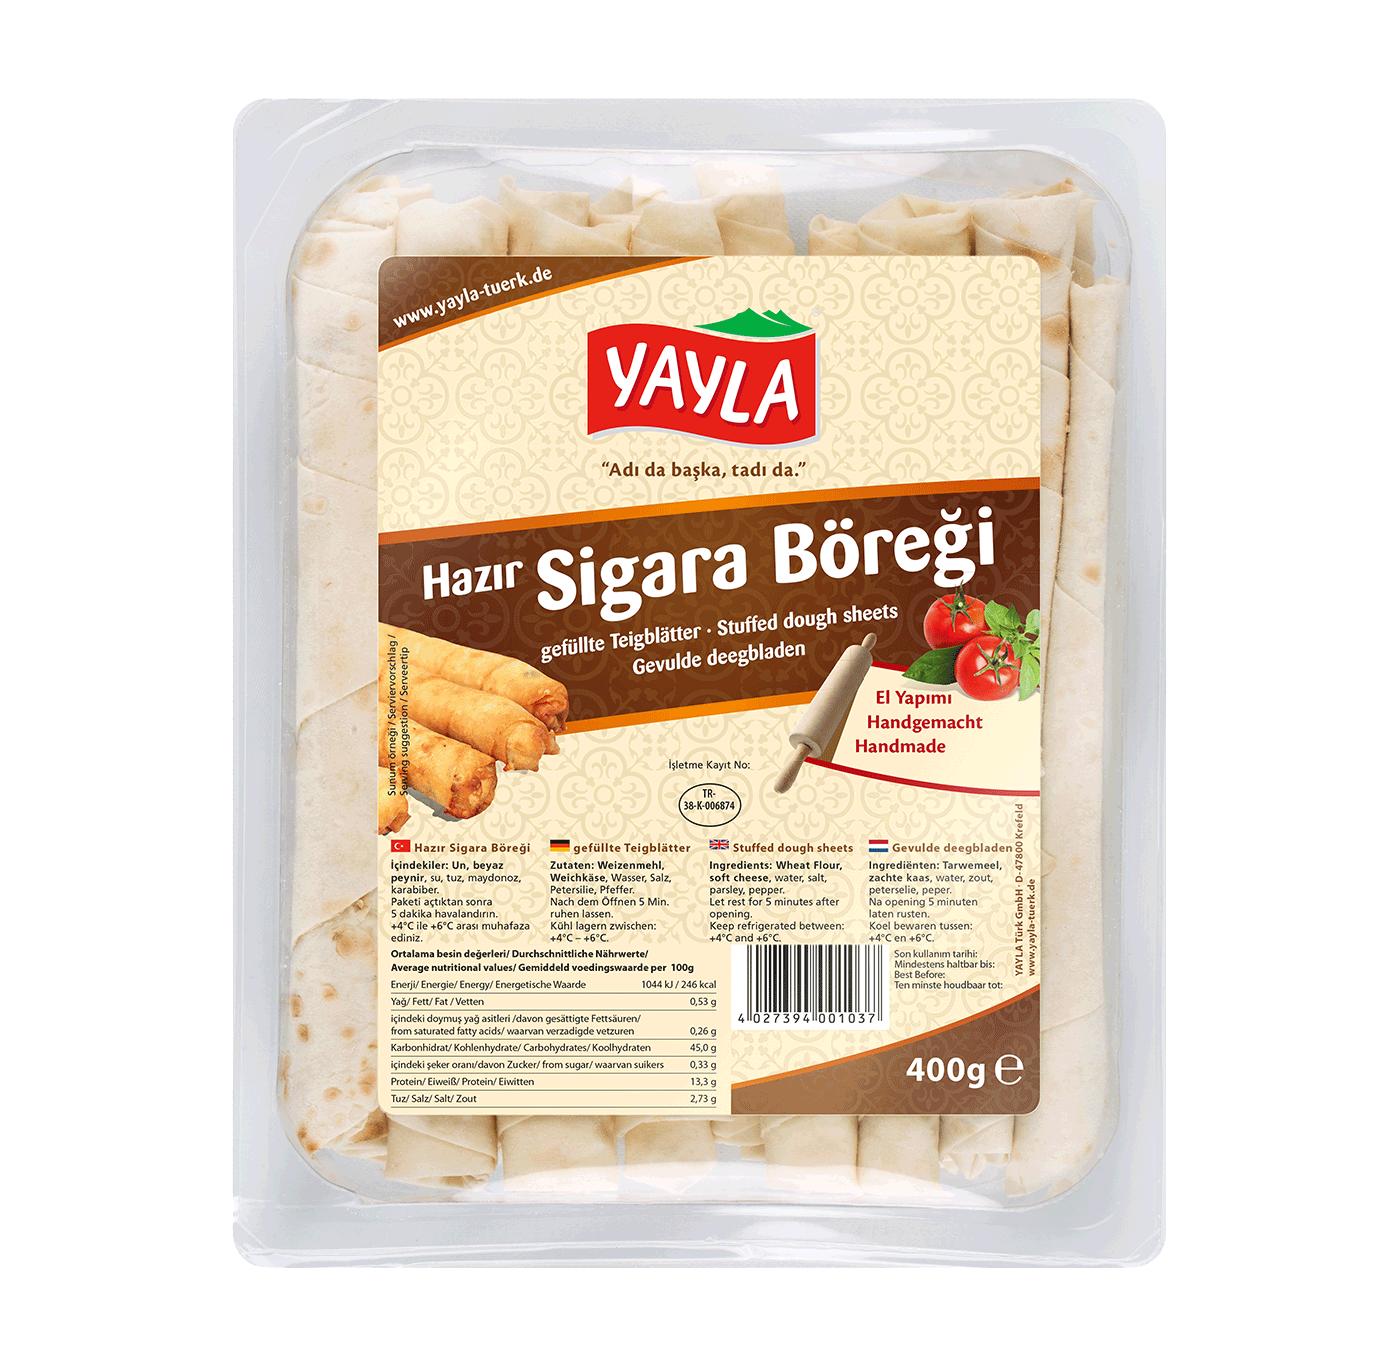 Yayla | Teigblätter mit Käse-Füllung